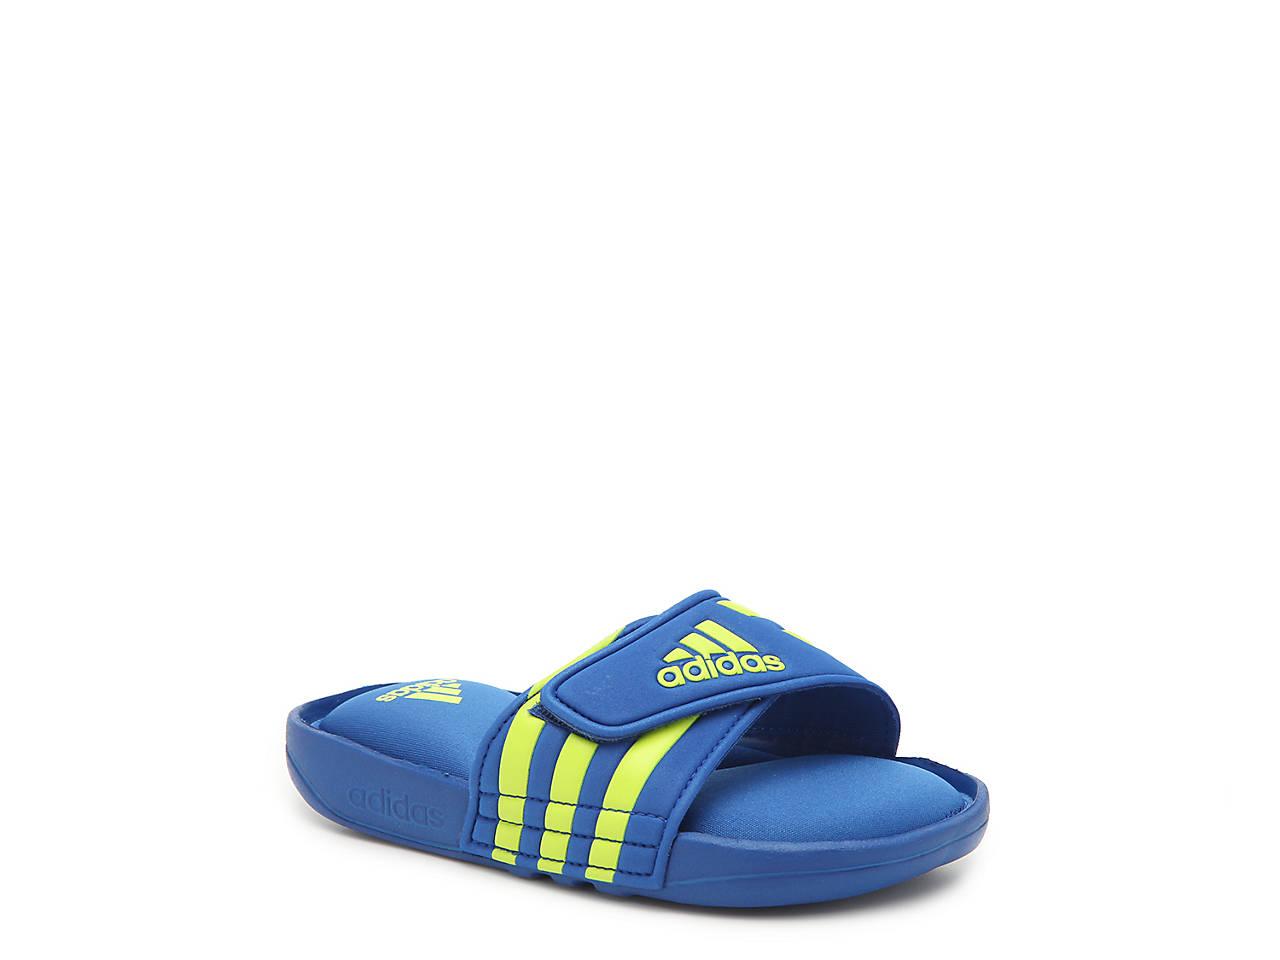 ffc773884 adidas Adissage K Toddler   Youth Slide Sandal Kids Shoes